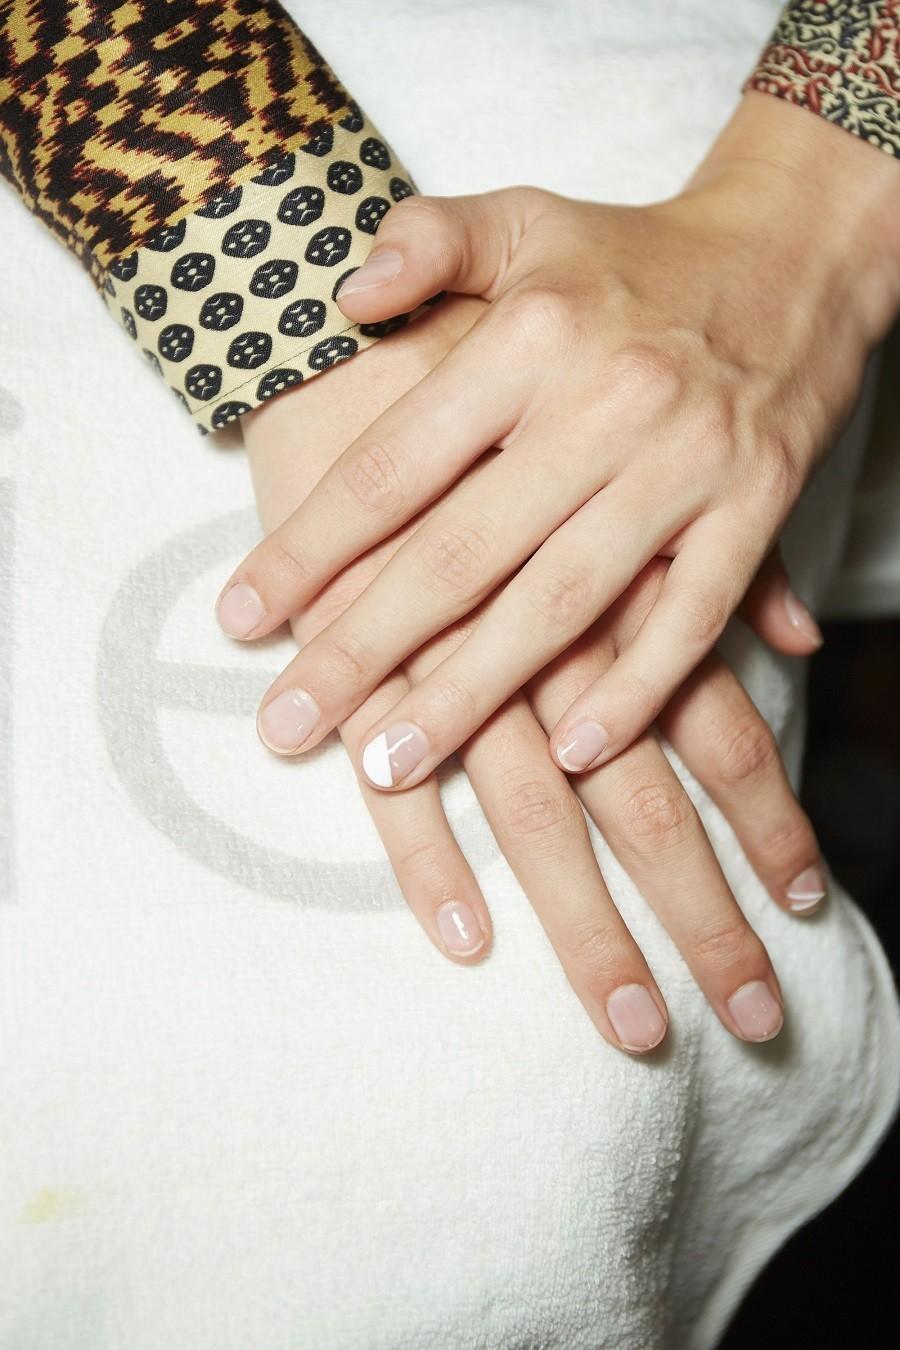 hbz-nails-essie-fw-sep18-monse-051-1536935939.jpg